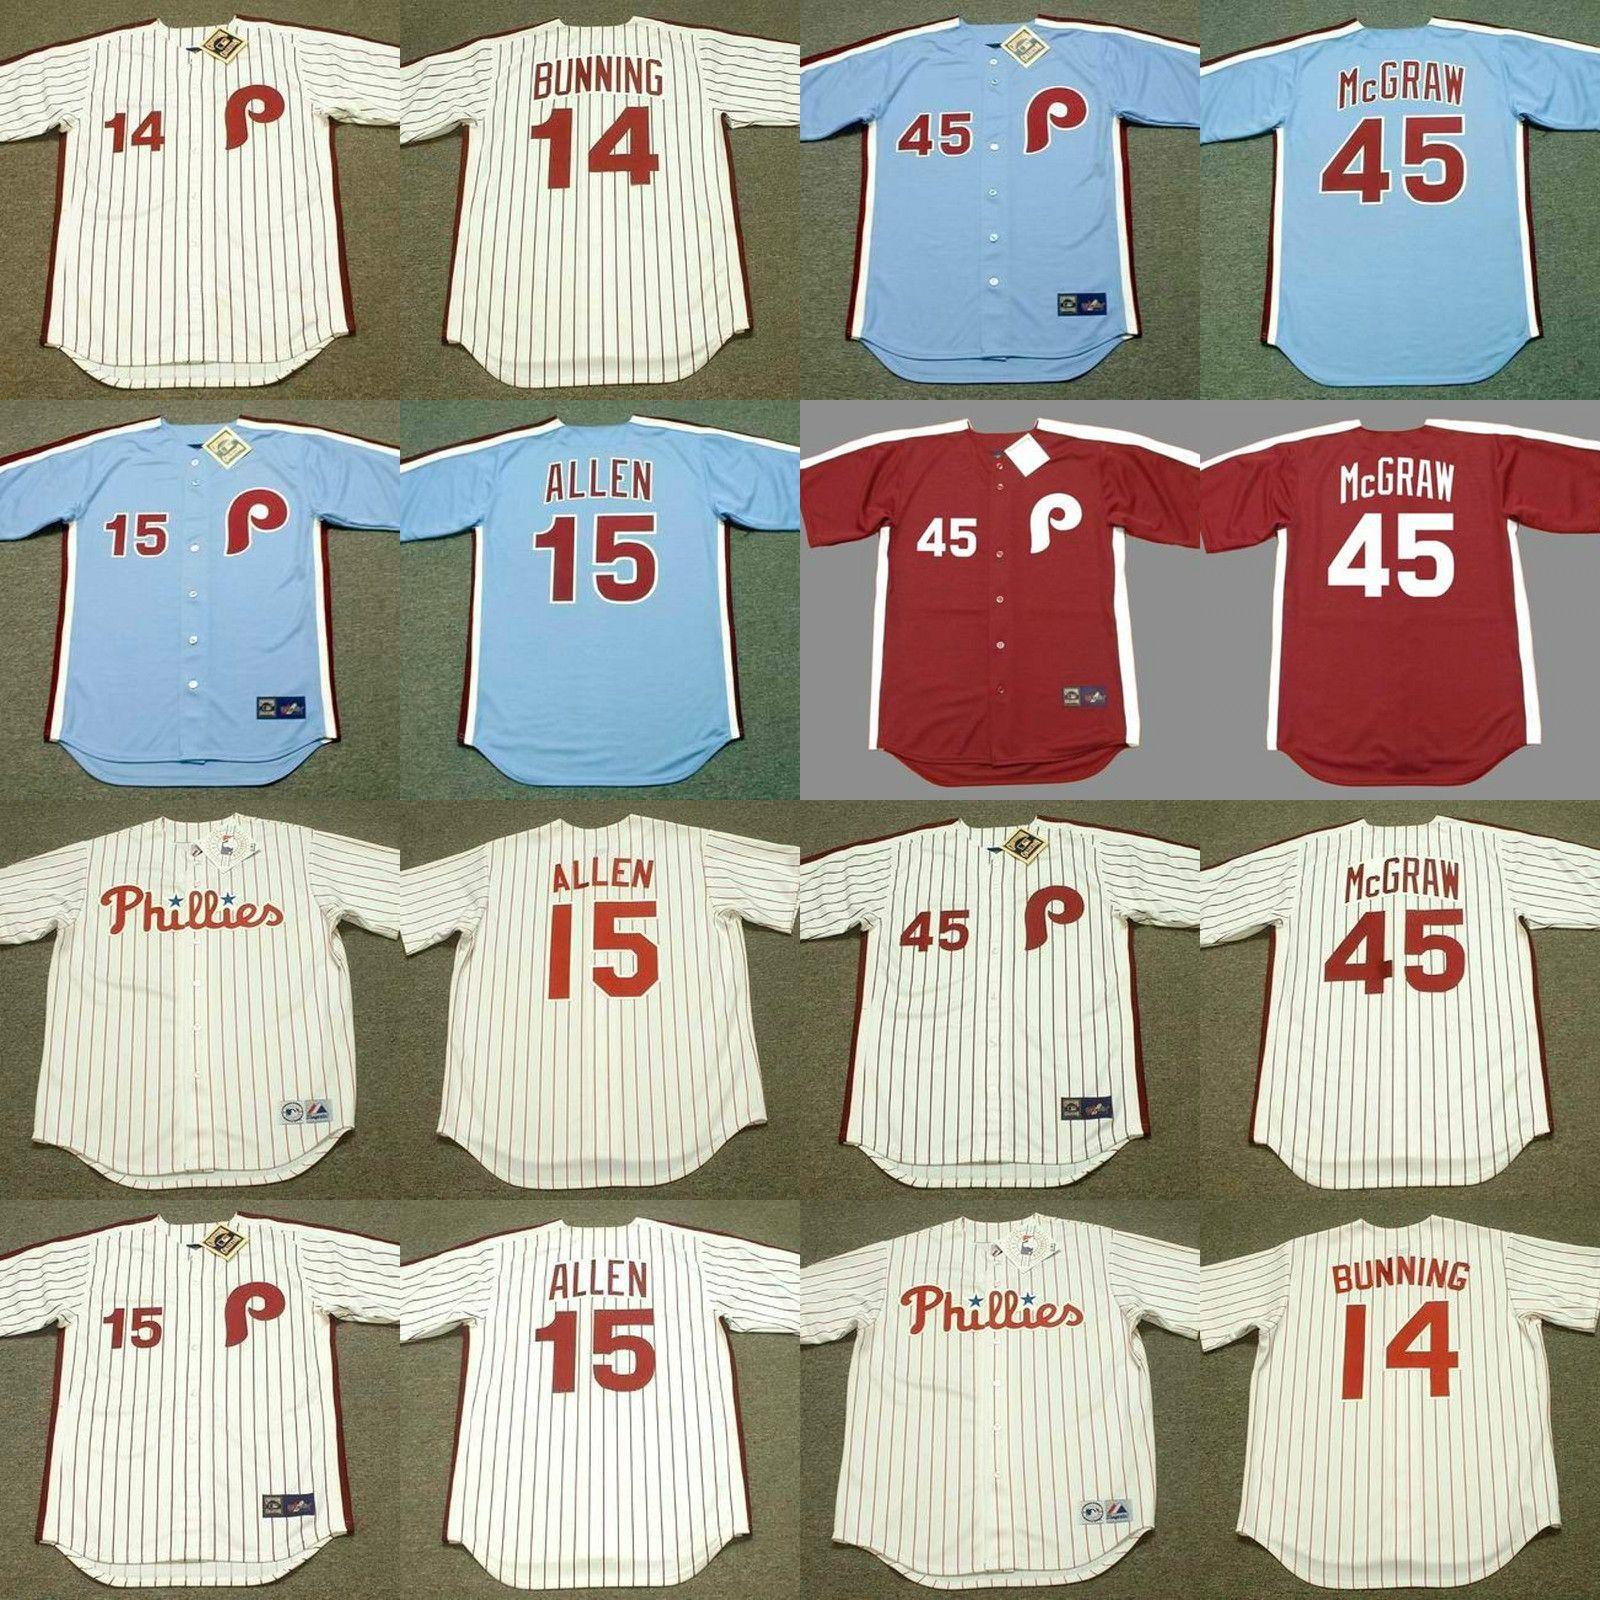 Philadelphia 45 Tug McGraw 11 TIM mccarver 30 DAVE CASH 39 JIM KAAT 41 Jim Lonborg 14 Jim Bunning 15 RICHIE ALLEN jérsei de basebol